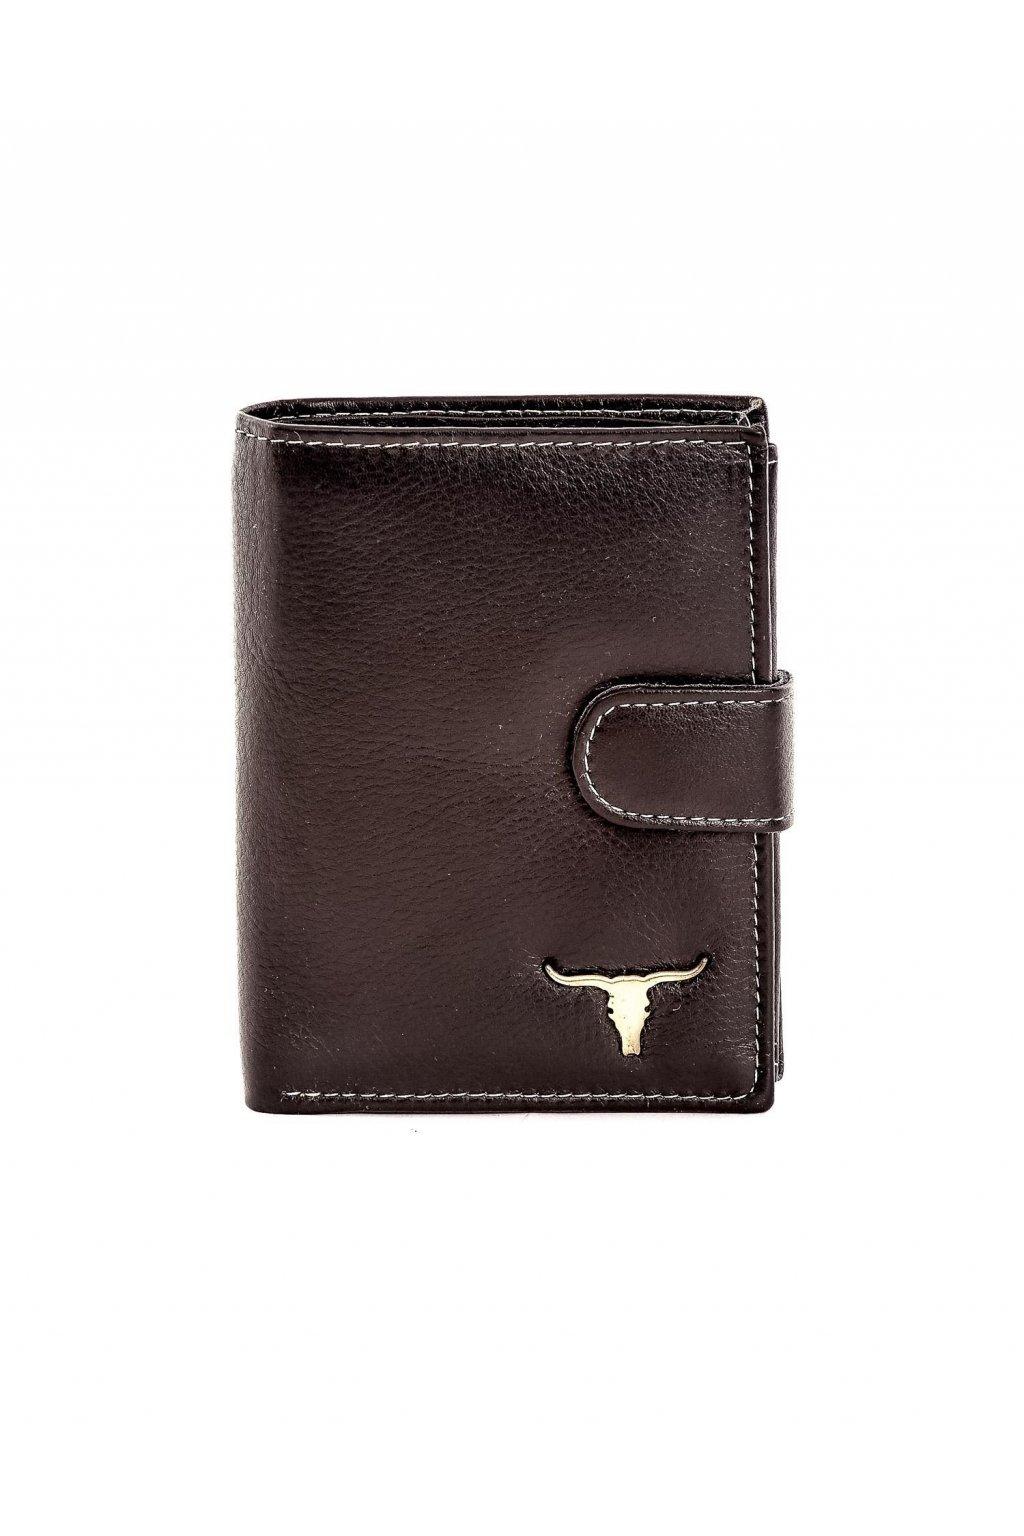 Pánska peňaženka kód CE-PR-RM-04L-BAW3.25